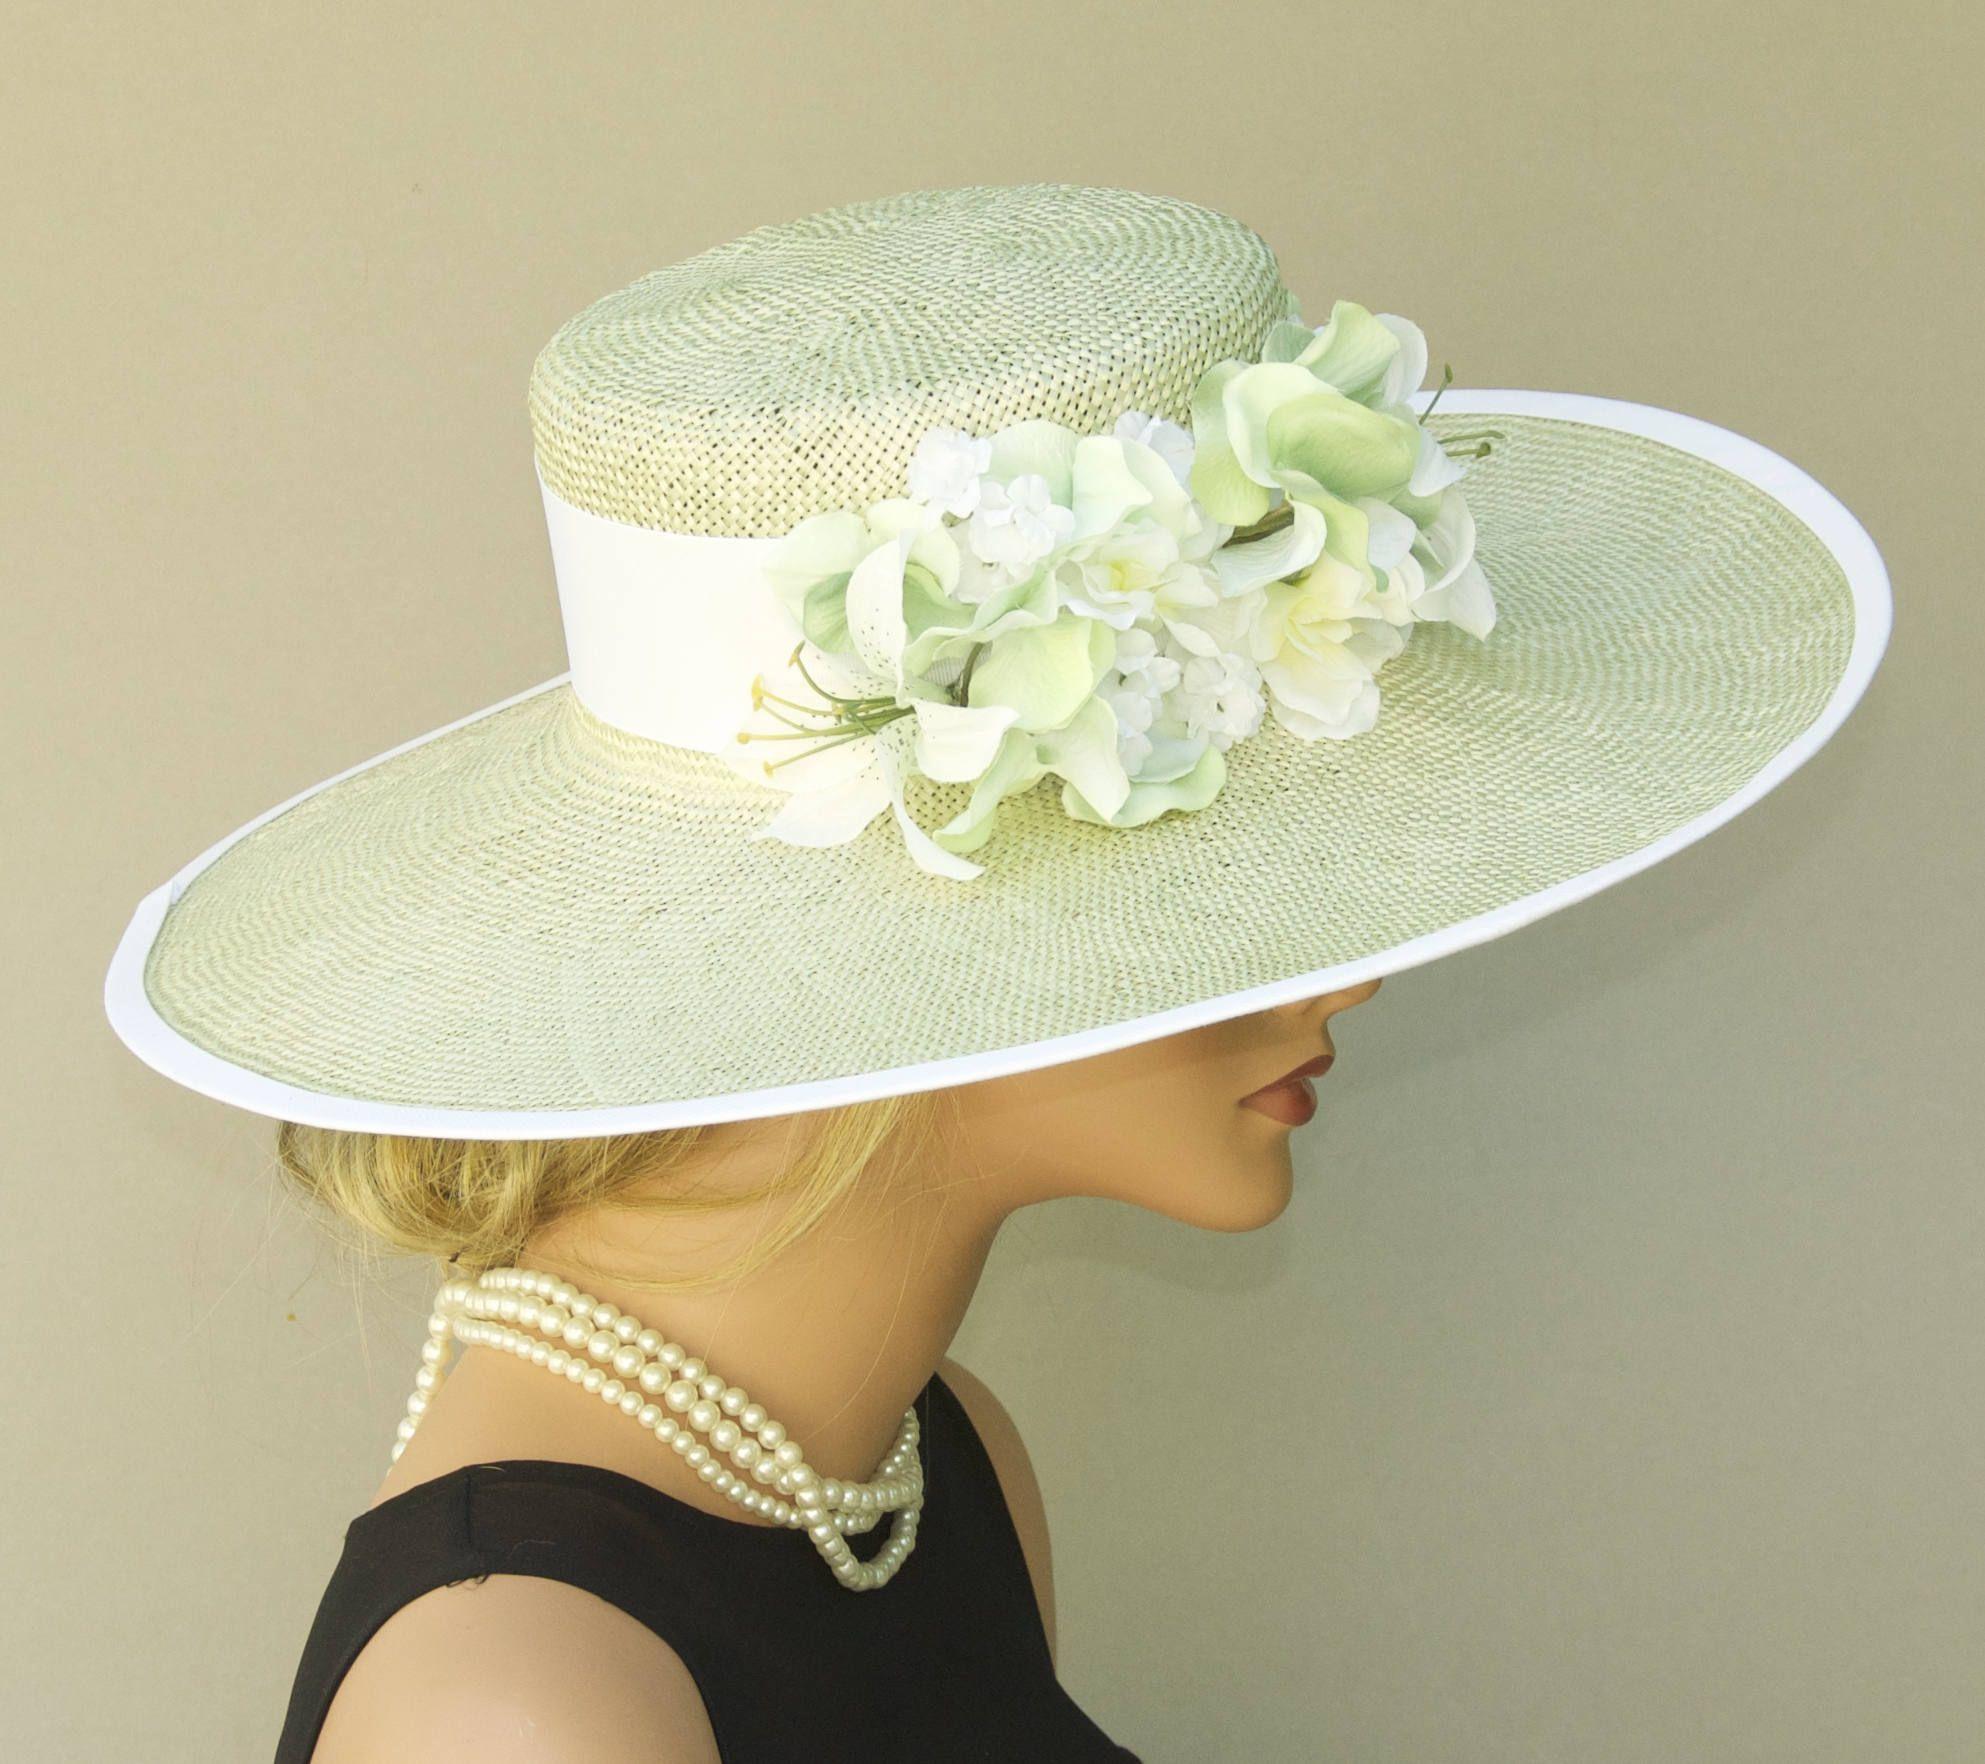 e513472e Wedding Hat, Wide Brim Hat, Church Hat, Derby Hat, Mint Green Hat, Formal  hat, Garden Party Hat, Tea Party Hat, Women's Pale Green Straw Hat